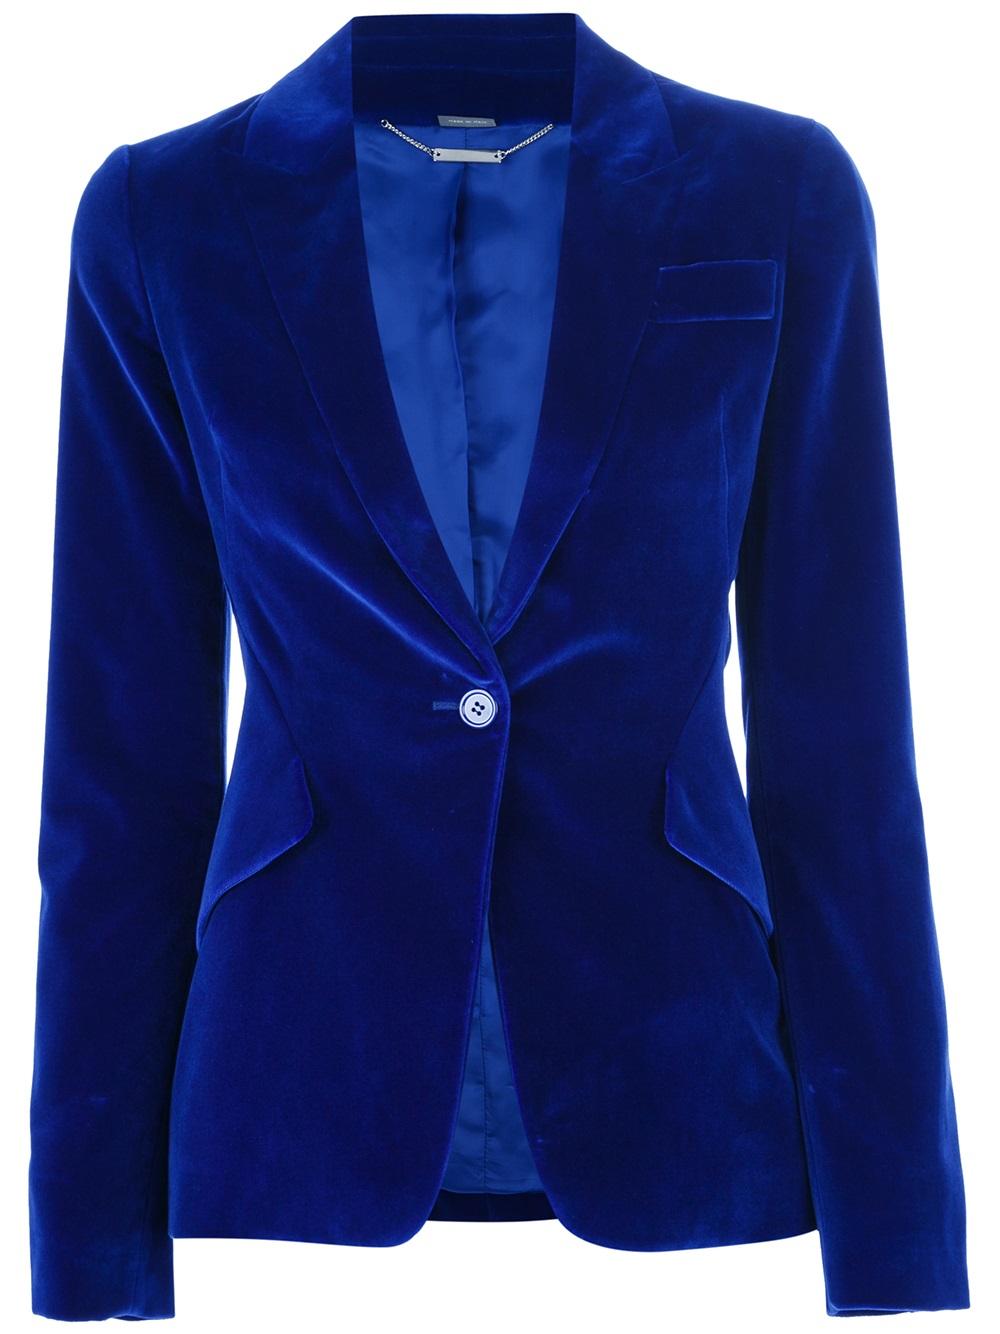 Navy Blue Anorak Jacket